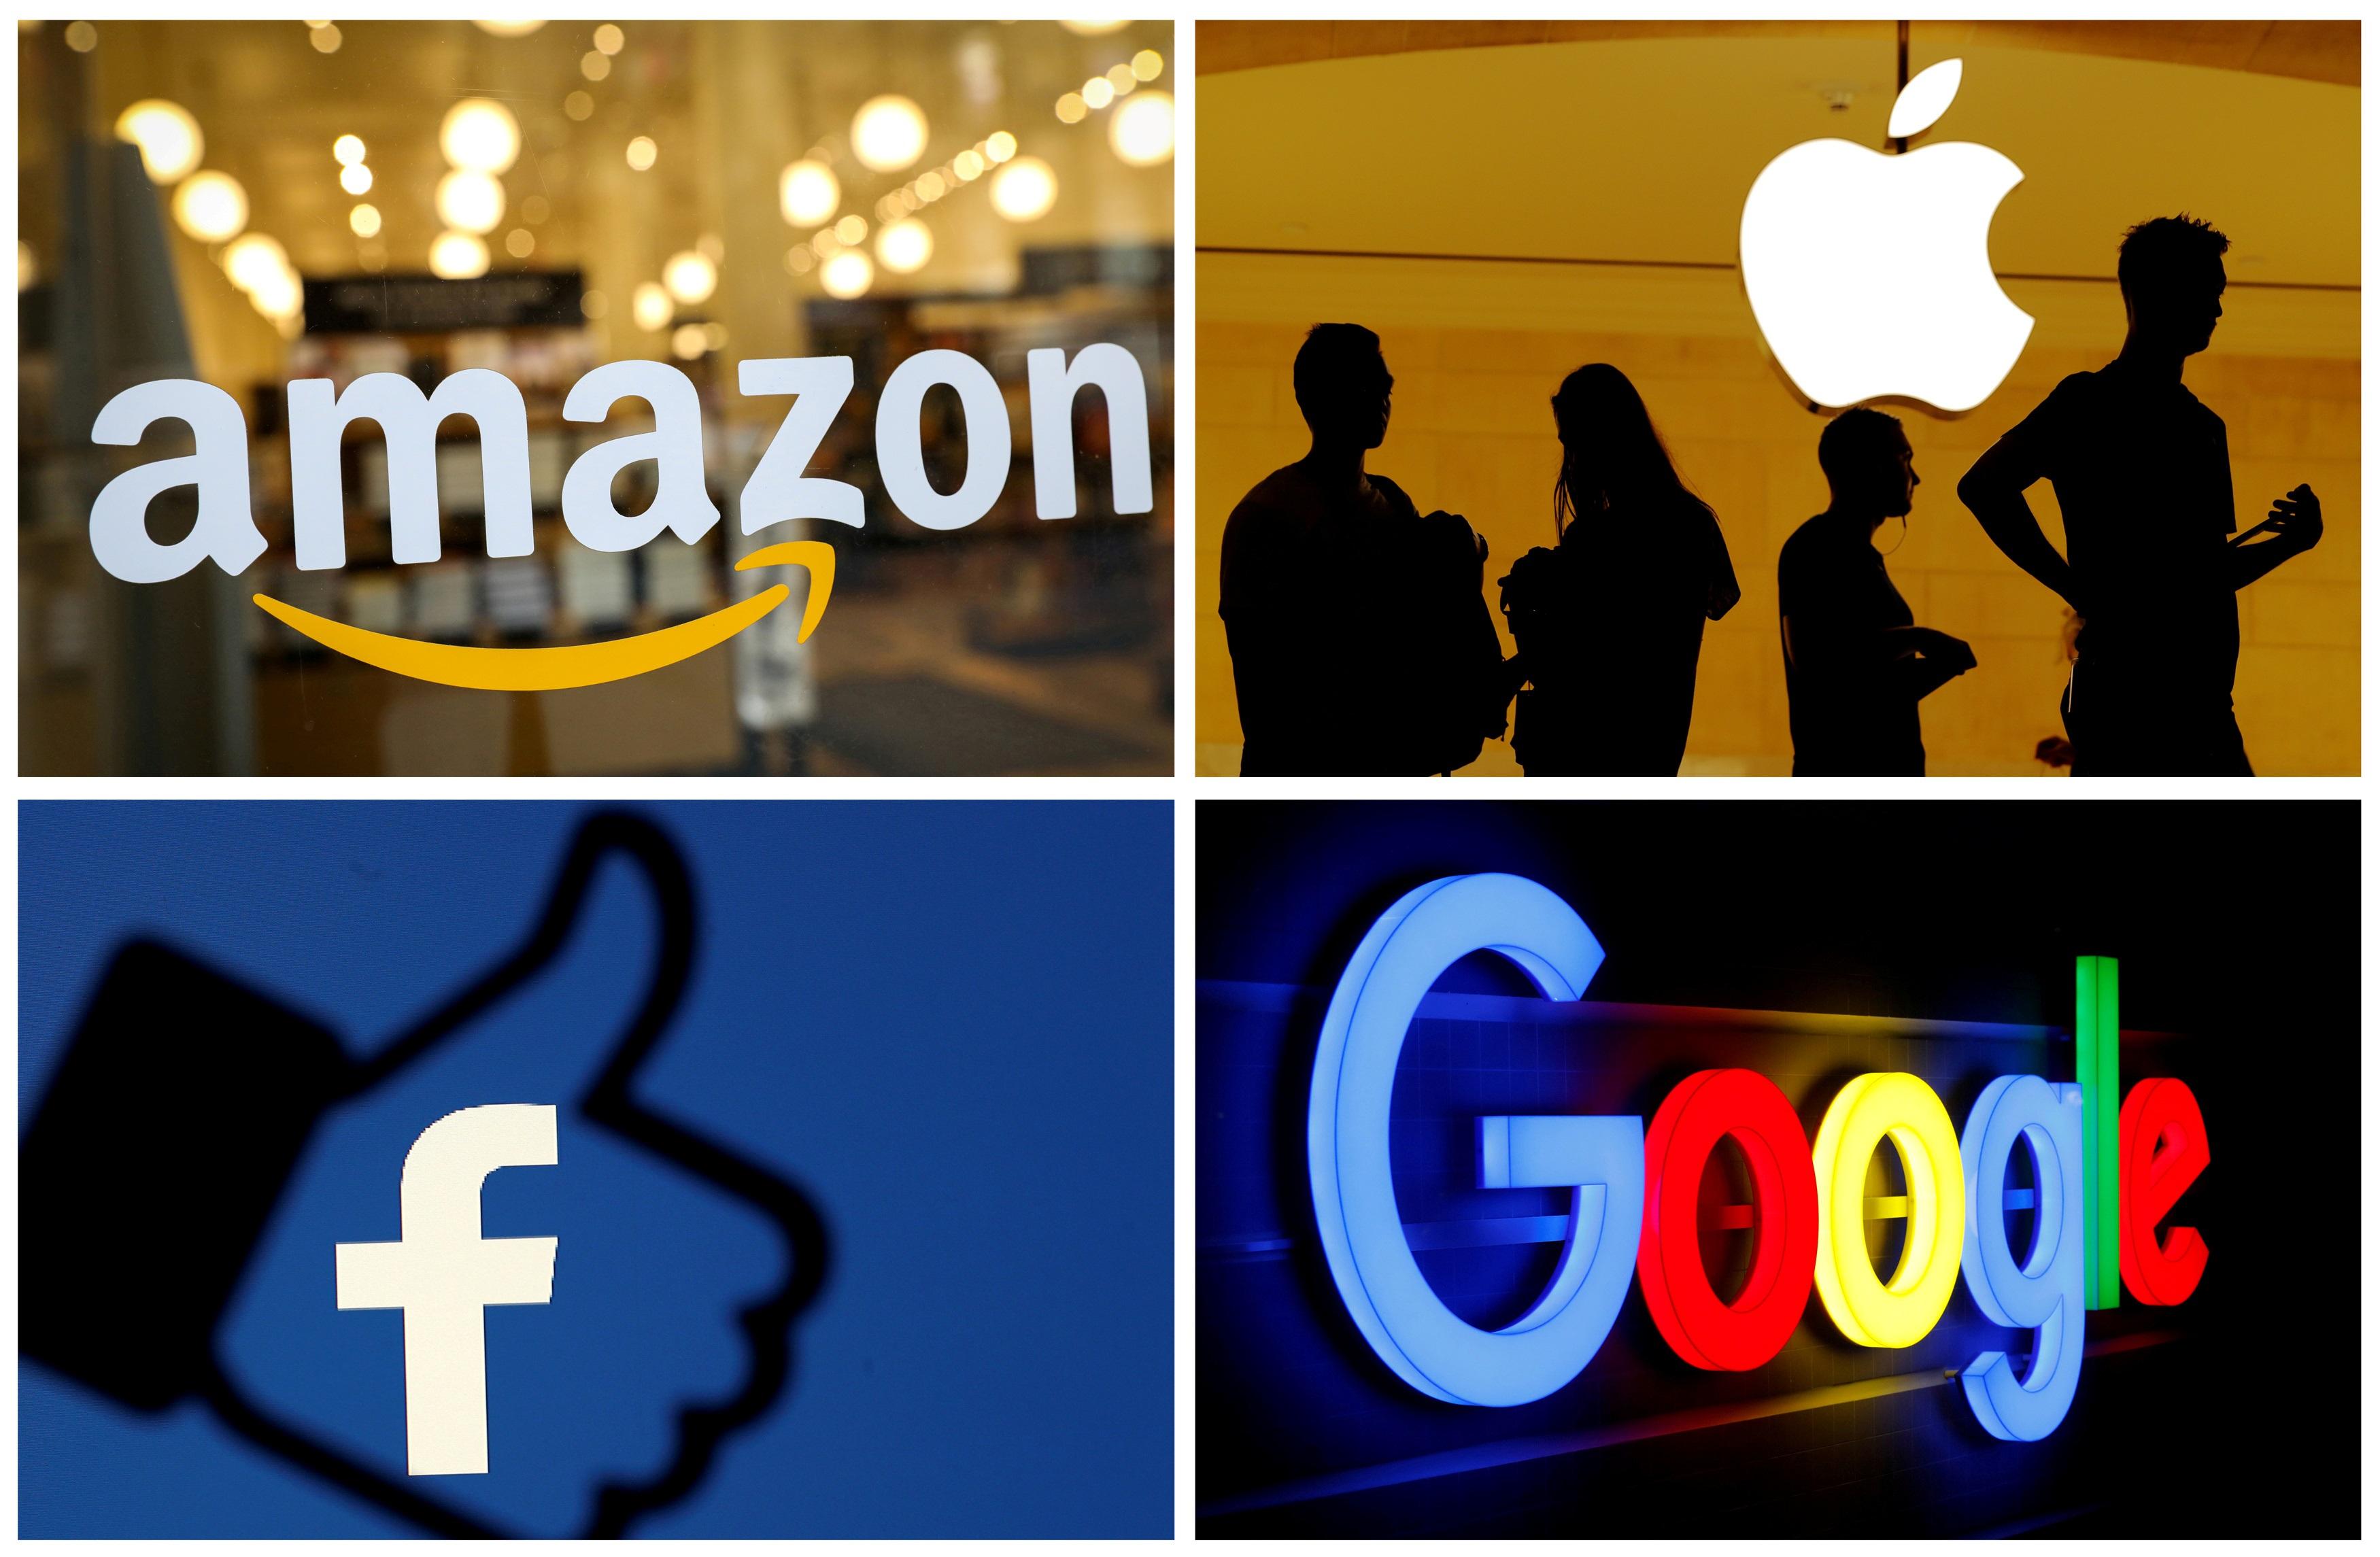 Amazon, Apple και Alibaba στην κορυφή της παγκόσμιας καινοτομίας - 3 δισ. οι χρήστες social media σε κινητά!